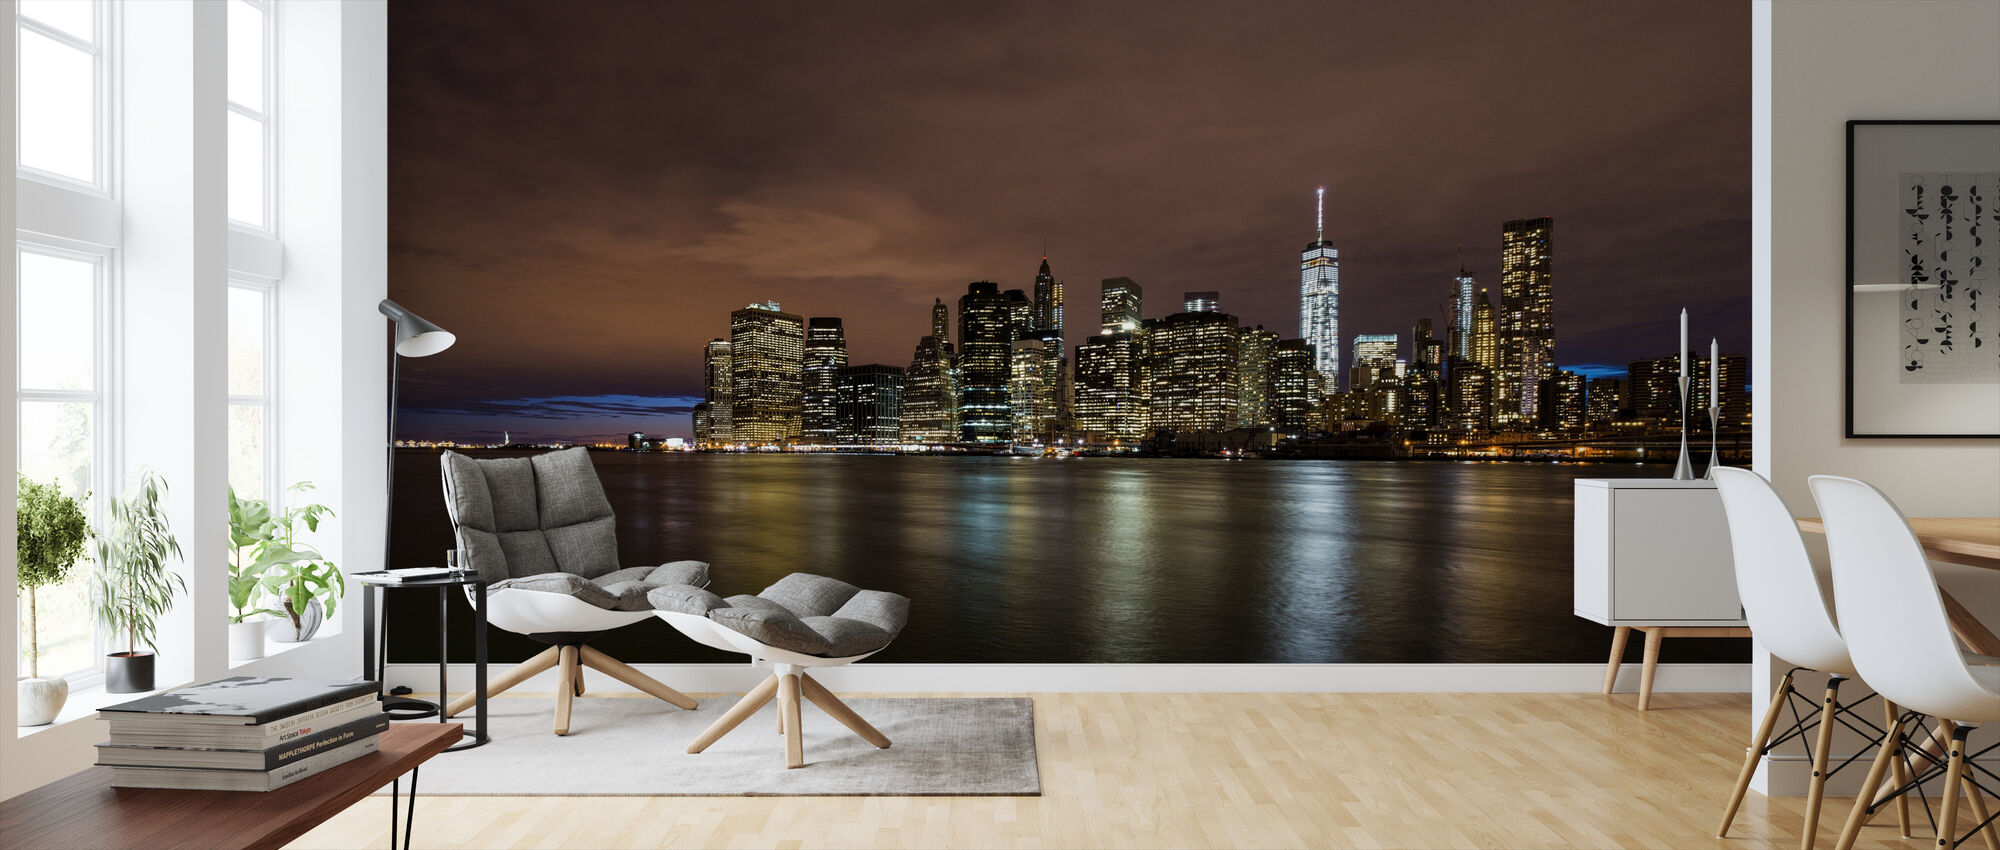 Cloudy Sky over Manhattan - Wallpaper - Living Room